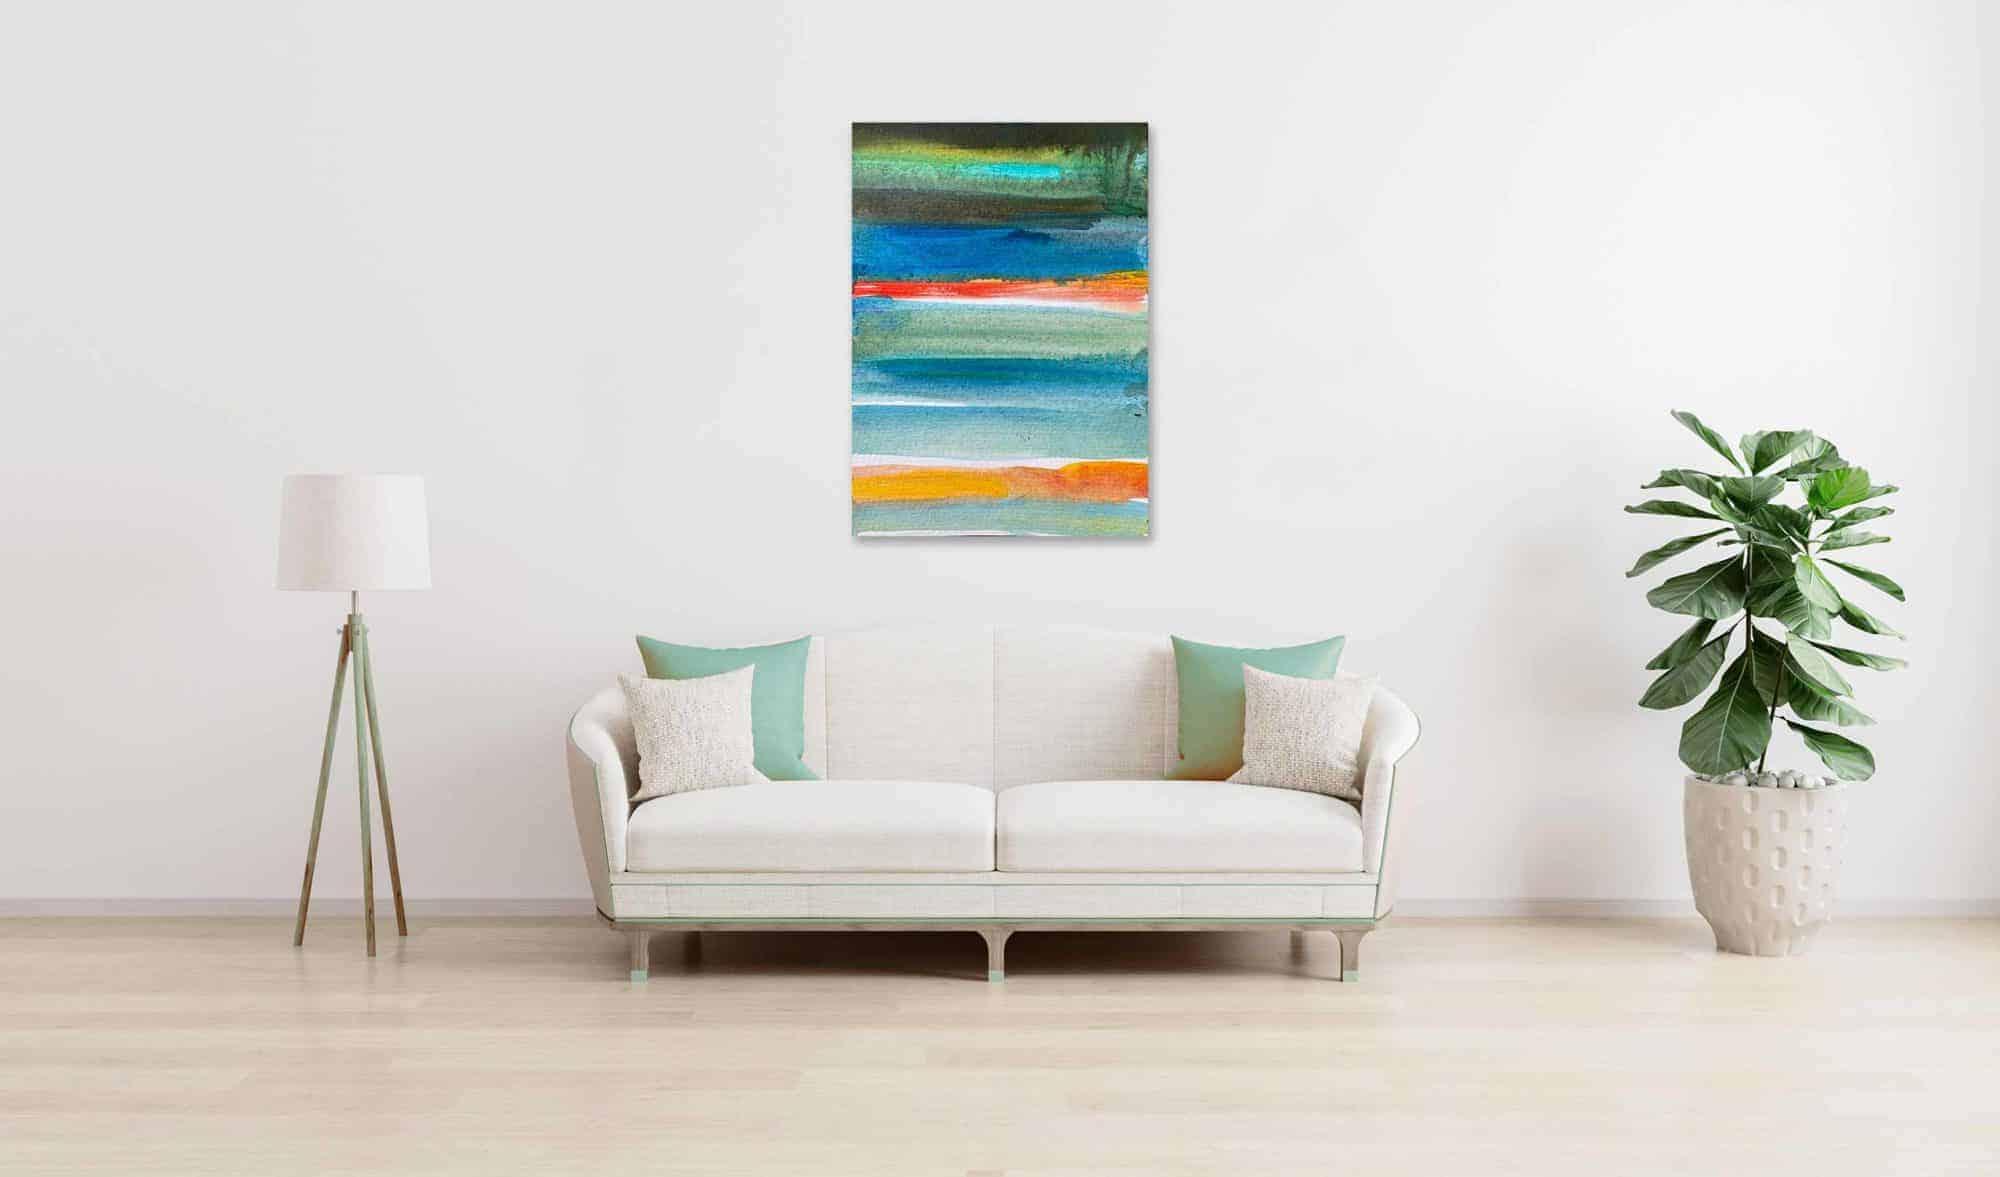 Ölgemälde auf Leinwand wandbild farbige Streifen